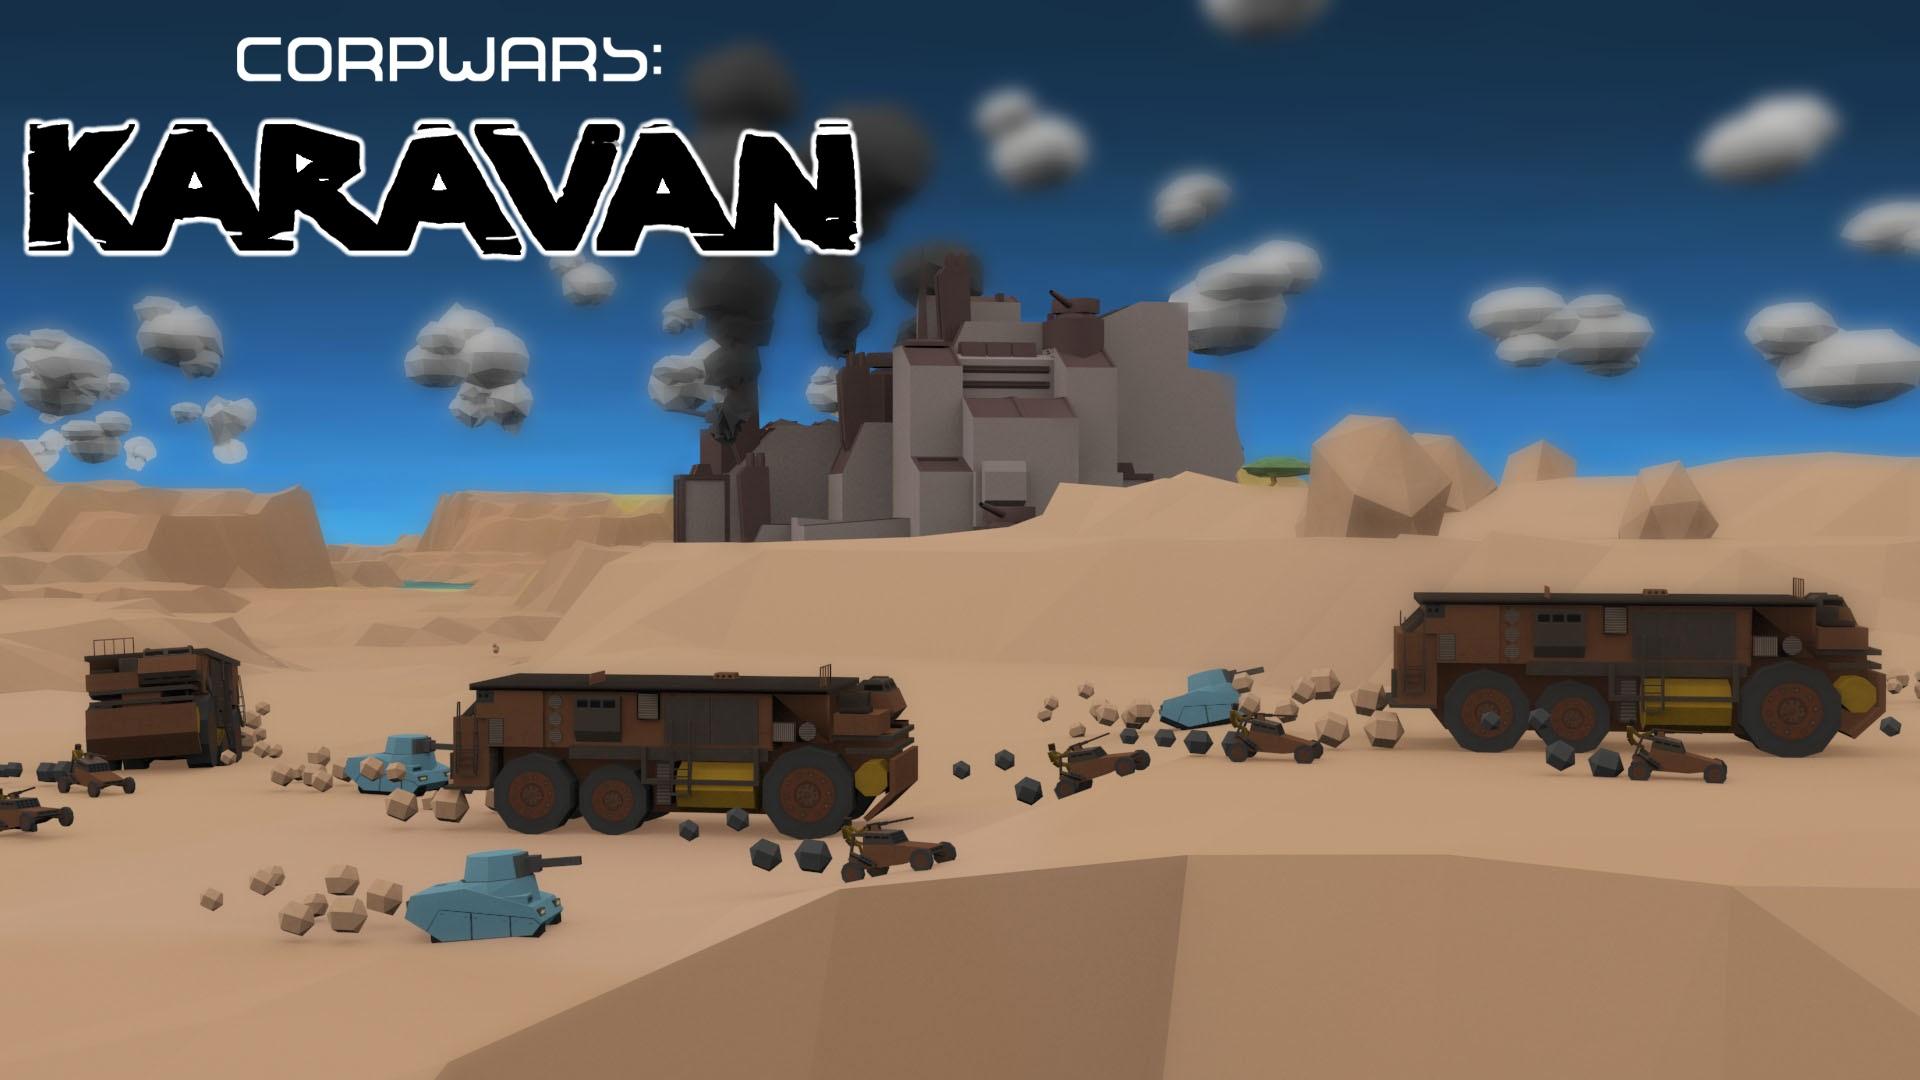 Corp Wars Equity Crowdfunding - Corp Wars: Karavan Mockup